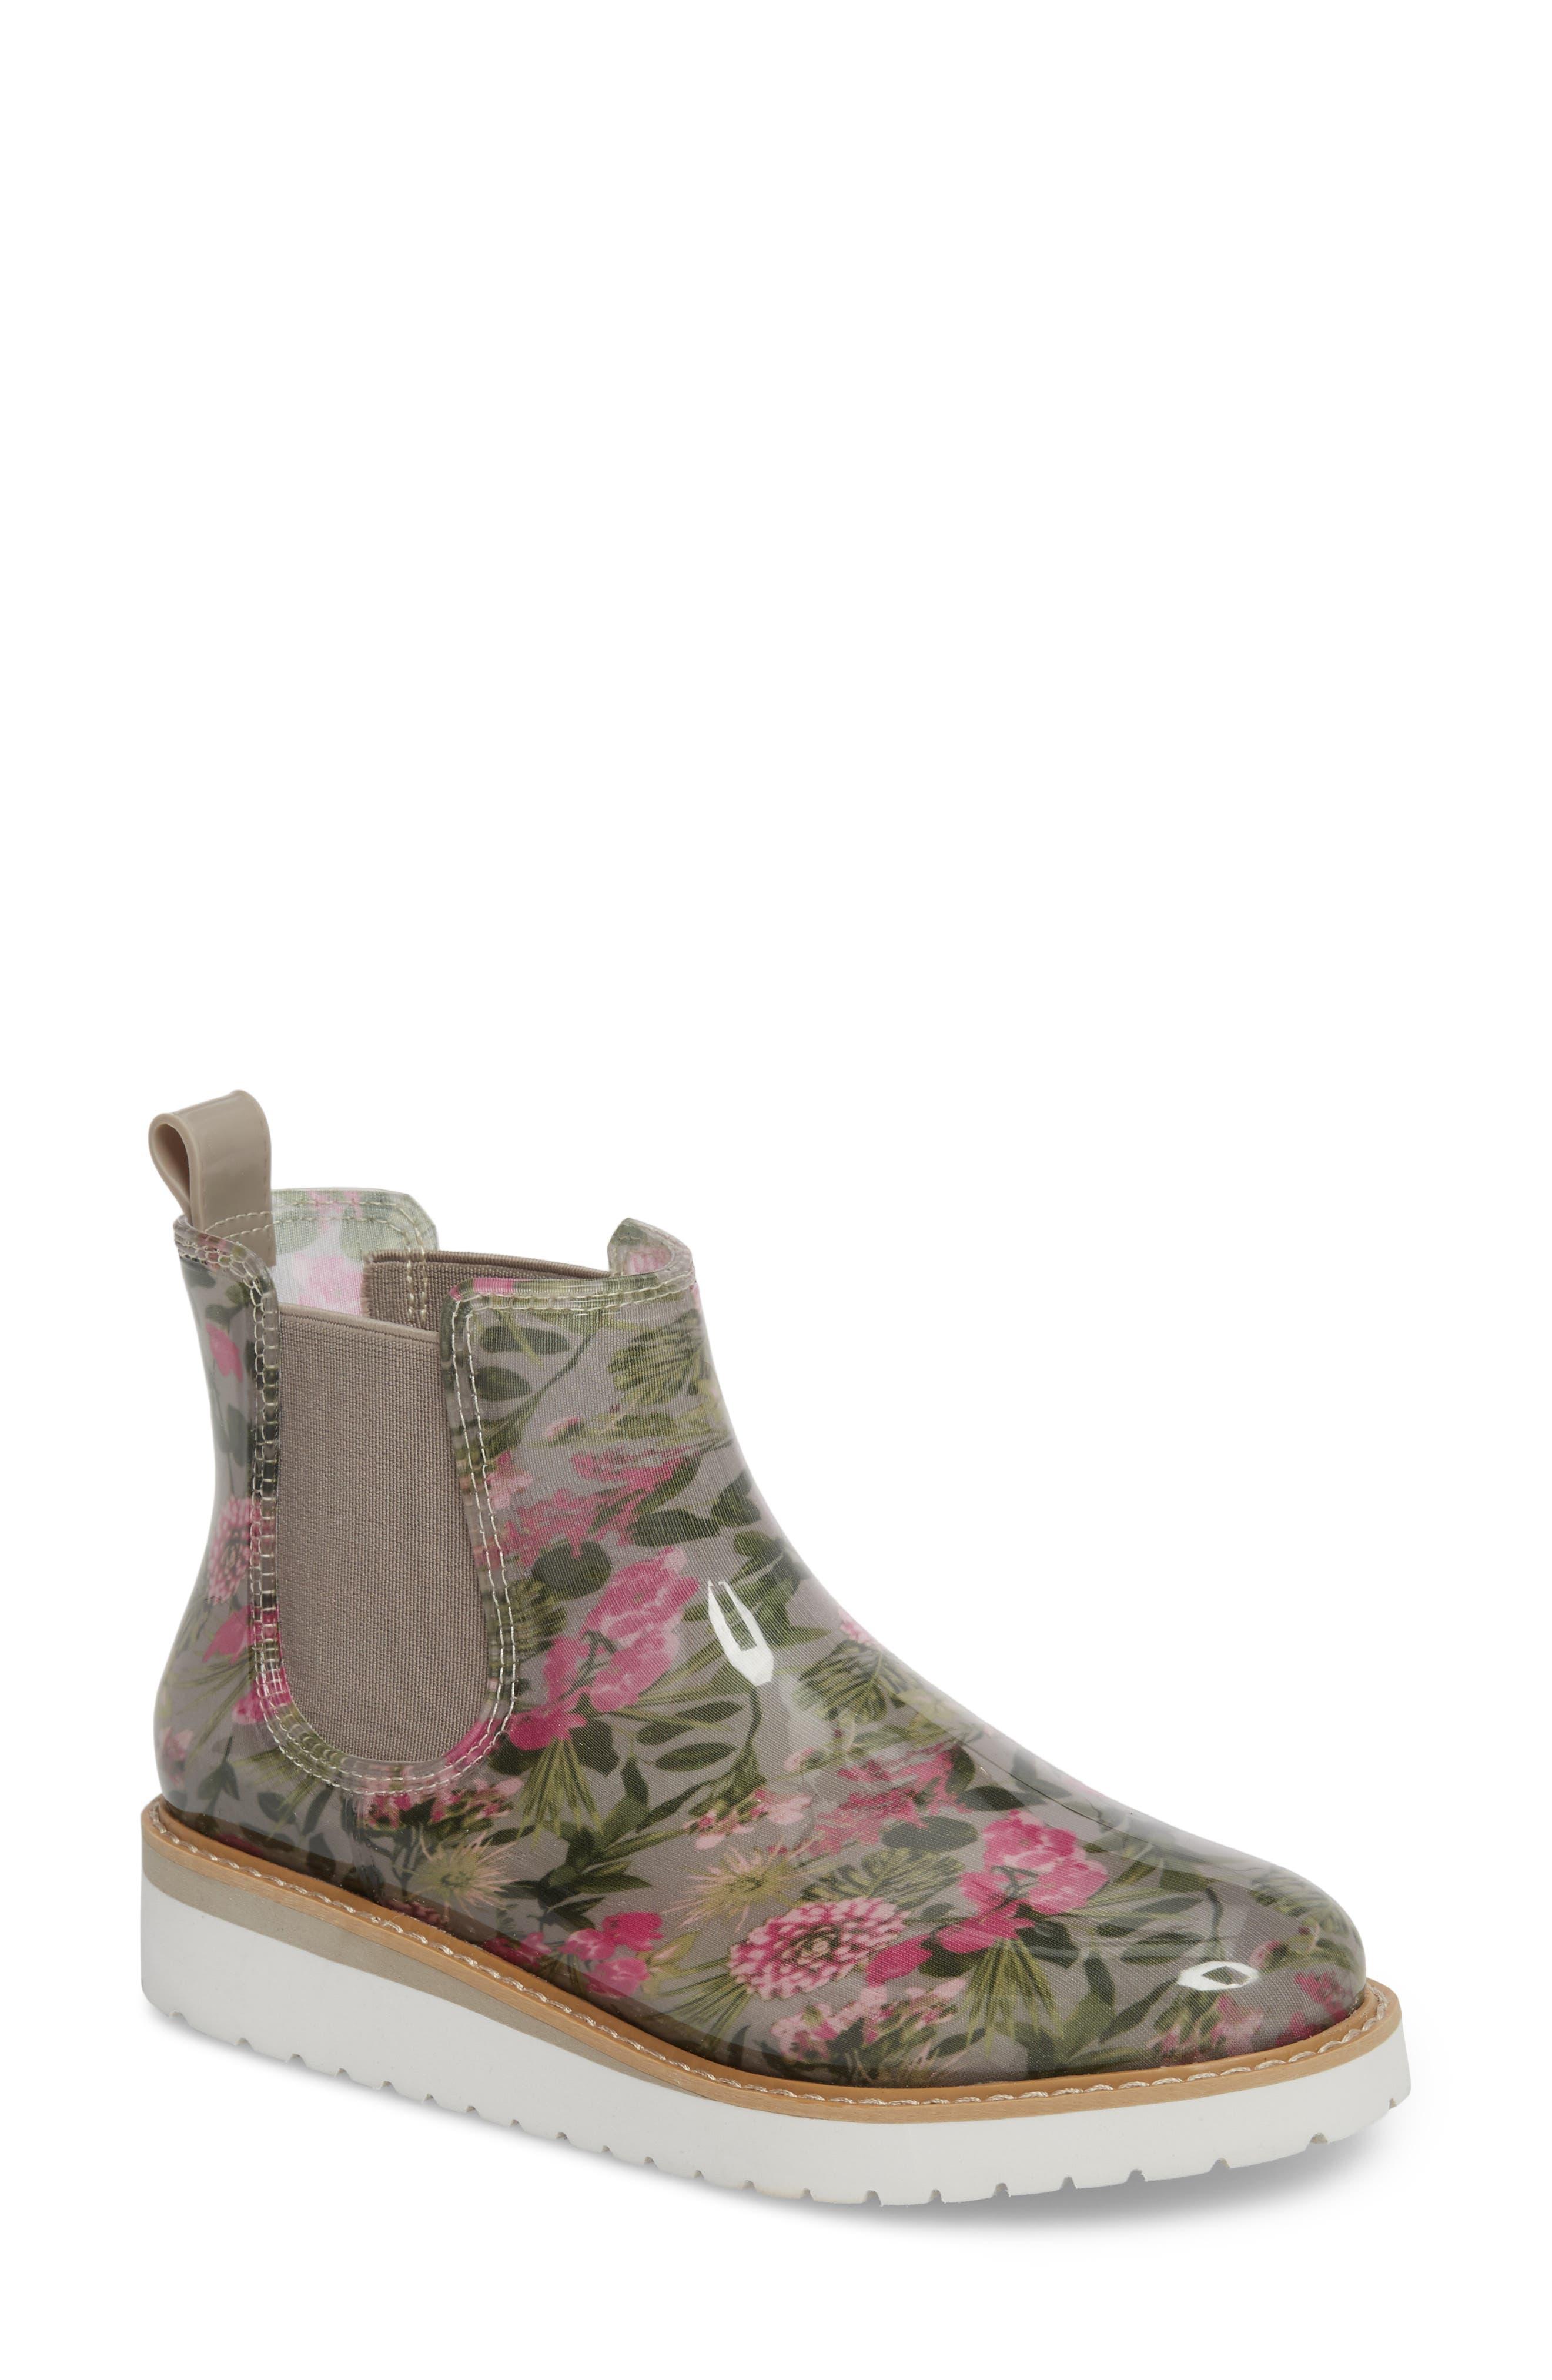 Kensington Chelsea Rain Boot,                             Main thumbnail 1, color,                             Tropical Floral